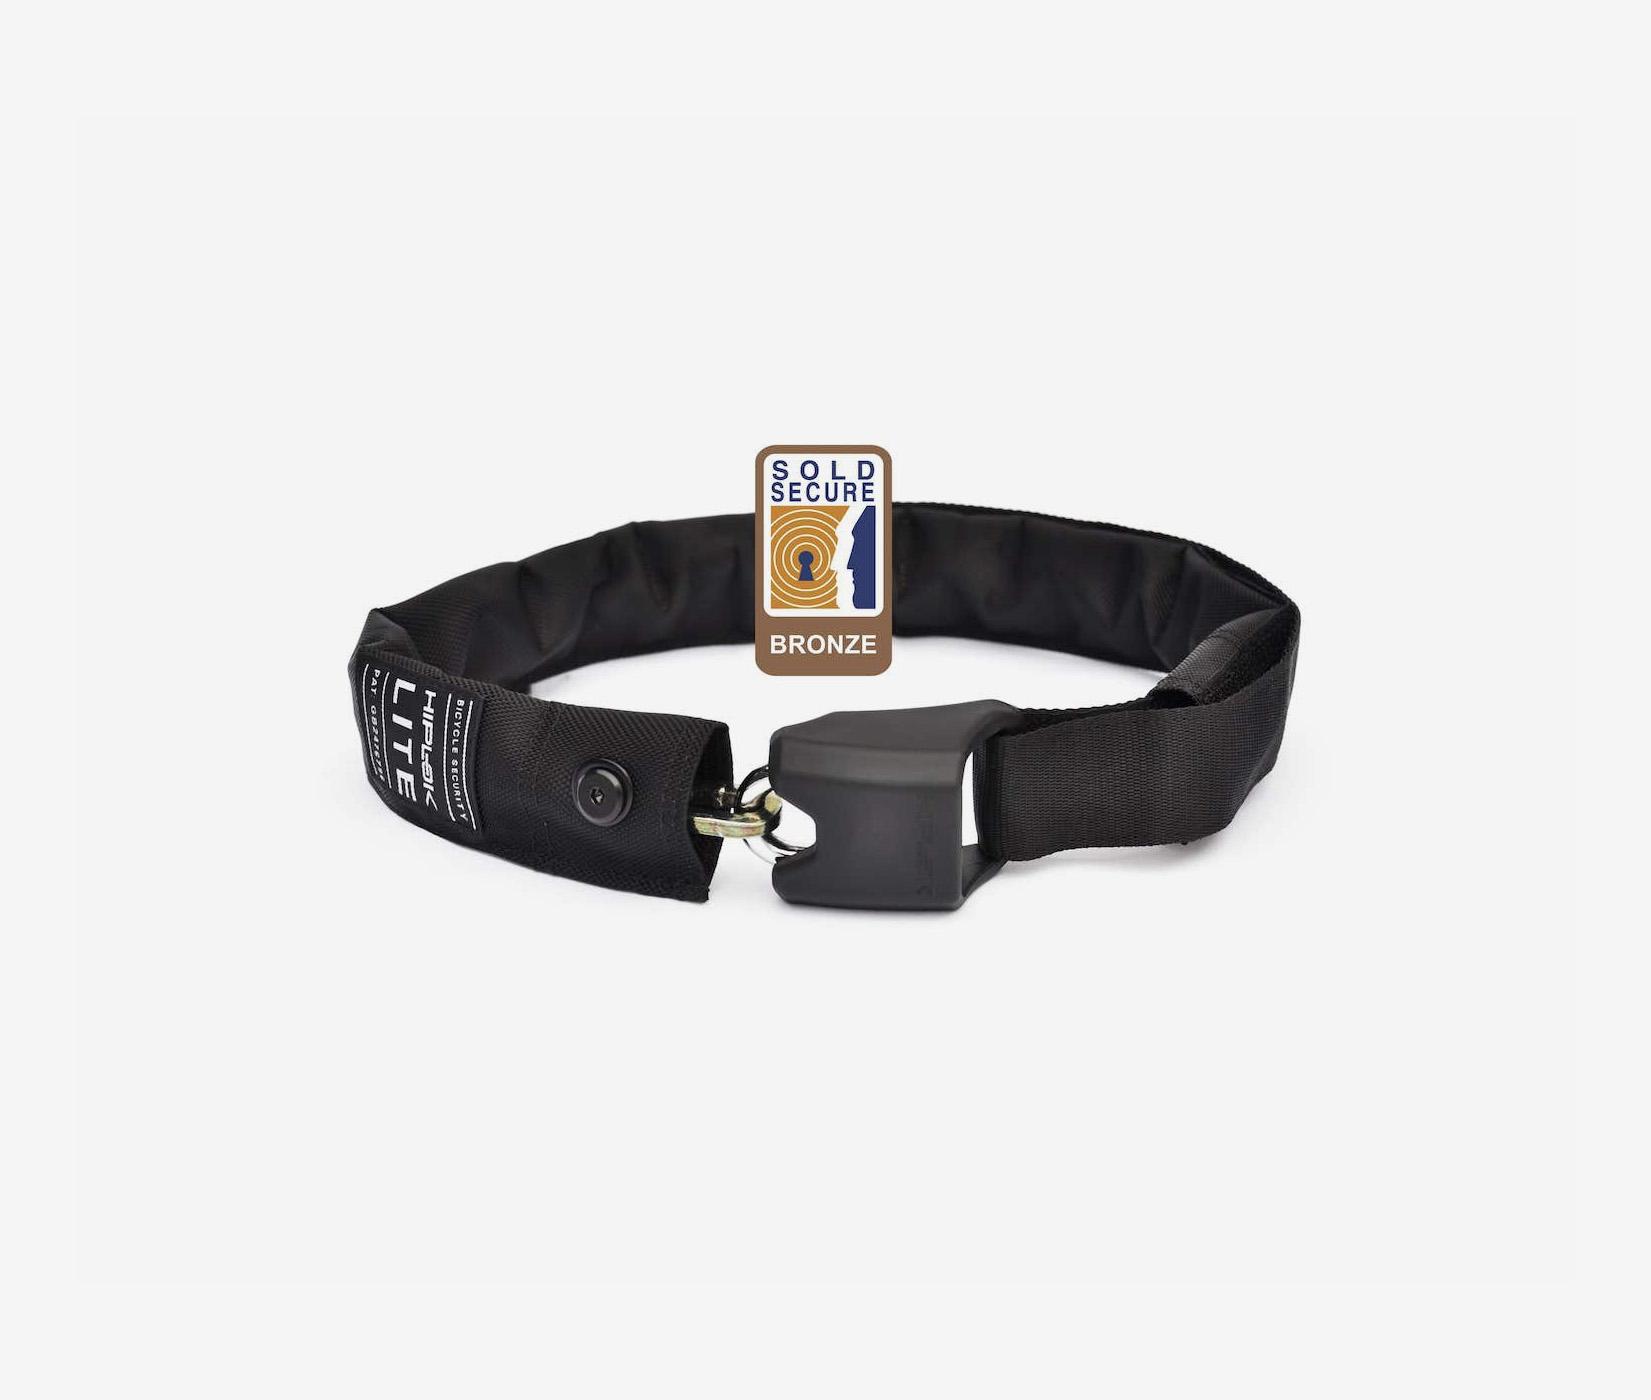 Hiplok lite black wearable chain lock sold secure bronze